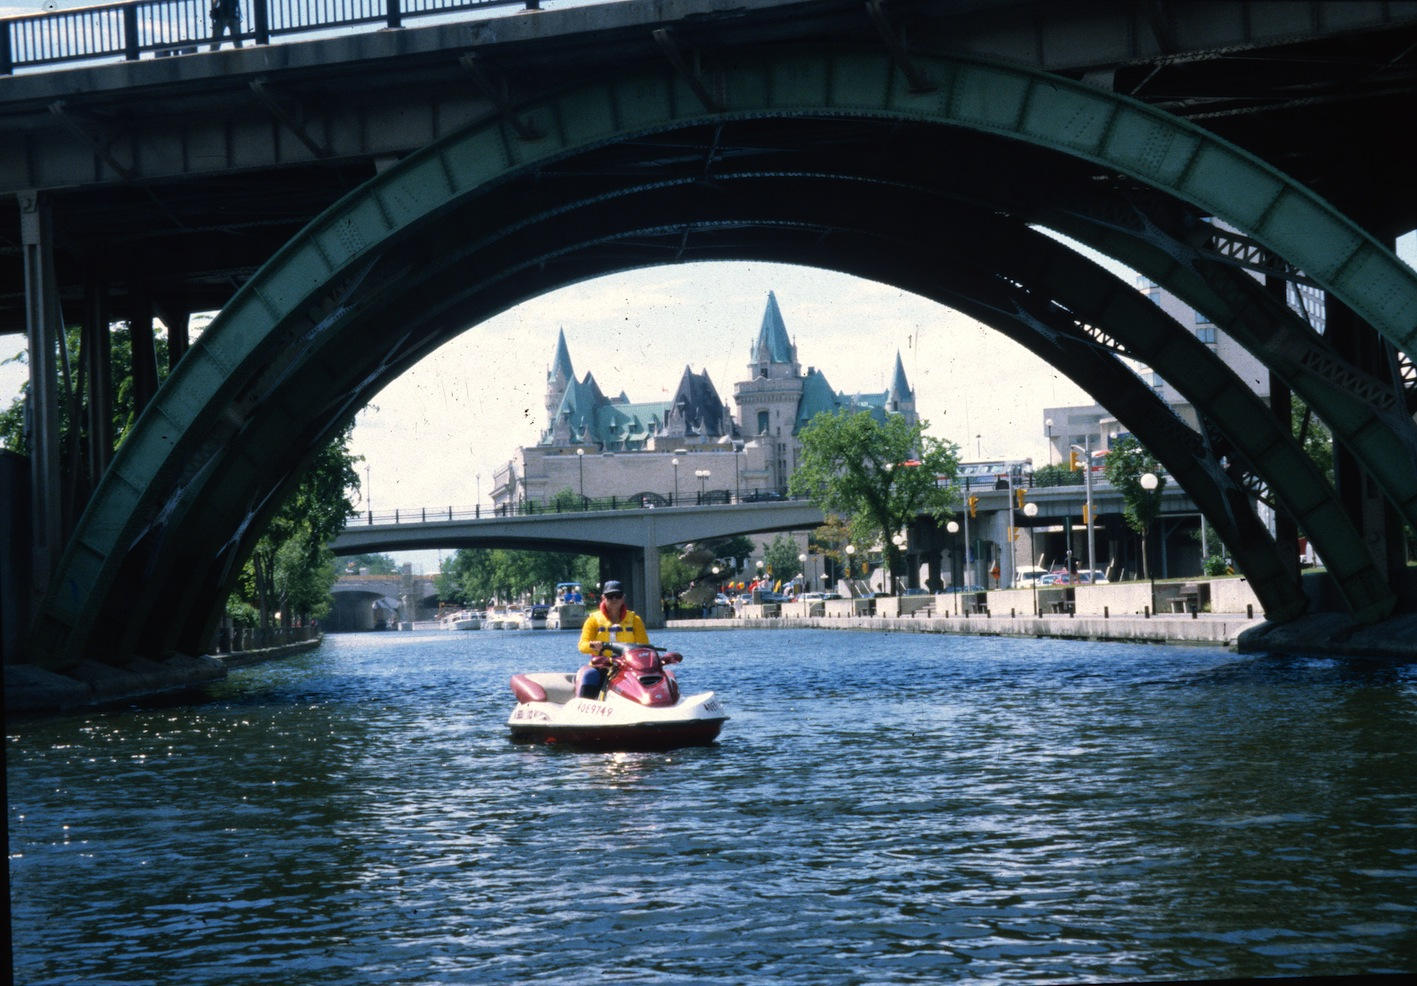 Ottawa Chateau Laurier on the Rideau Canal Sea Doo Tour